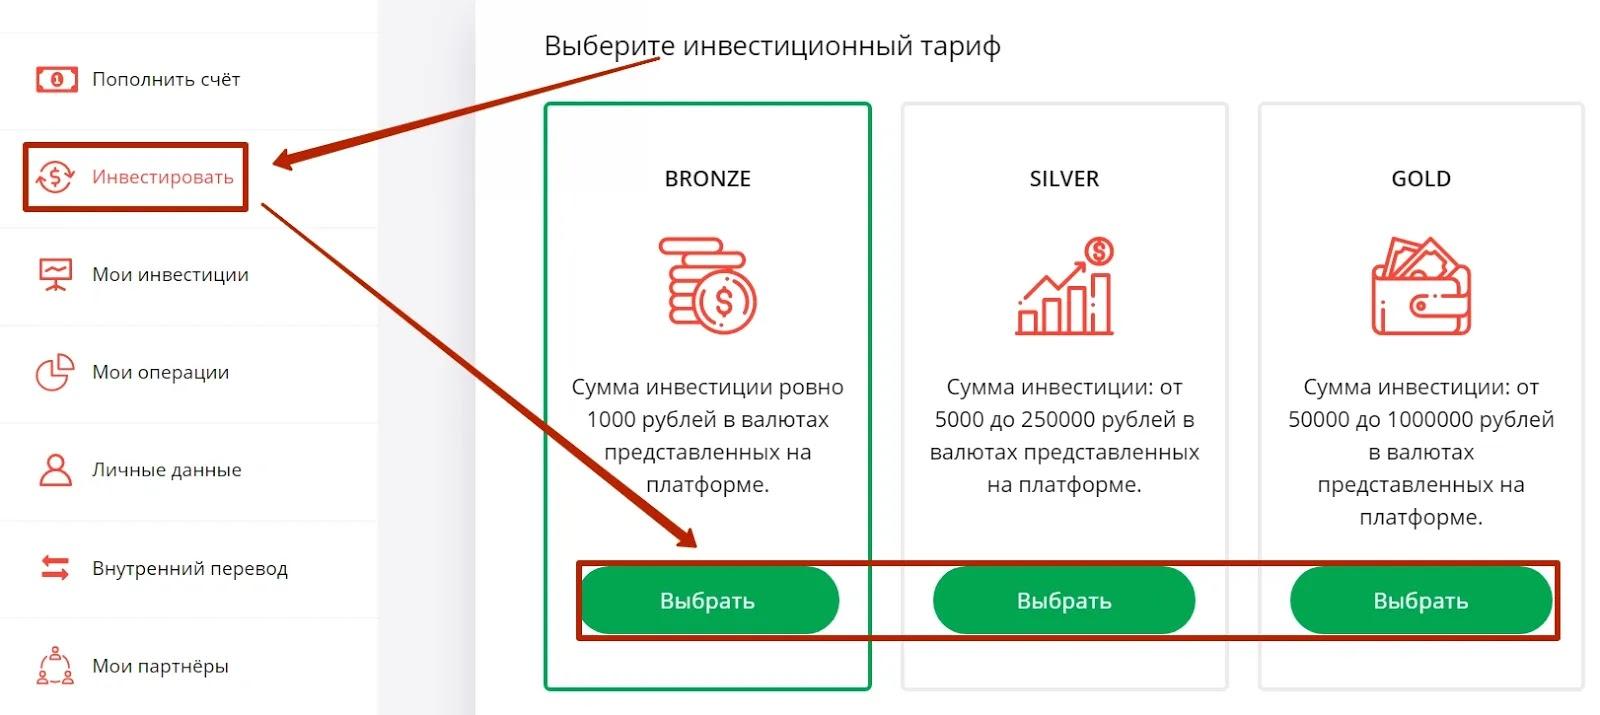 Создание депозита в CashStream